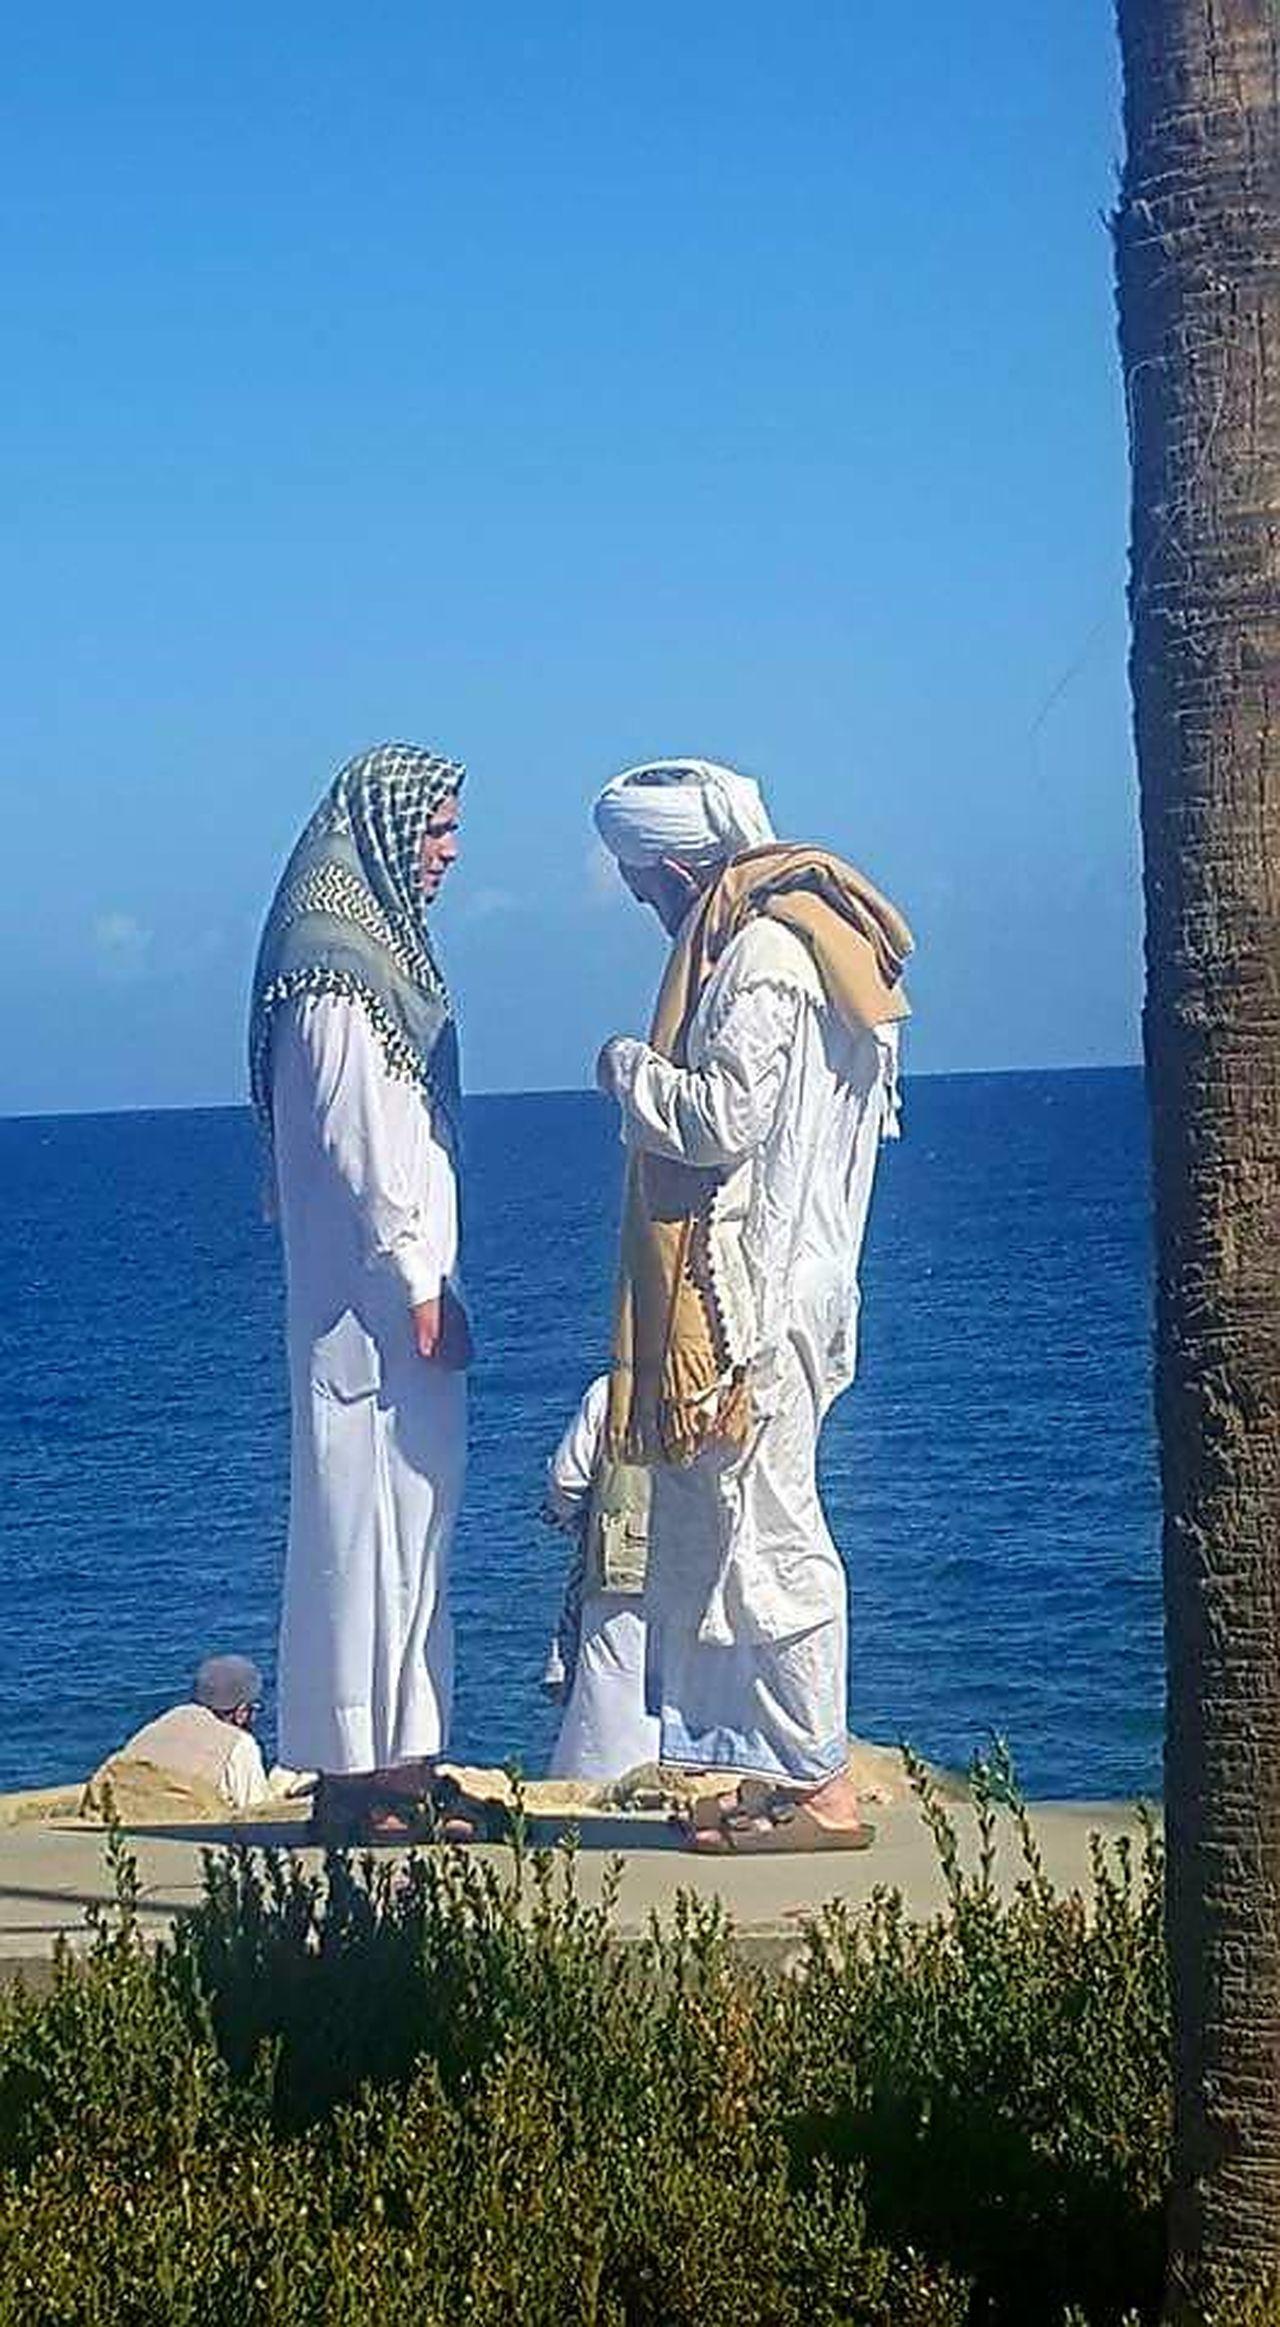 EyeEm Gallery Men Men Talking Outdoors People Sea Someone Special Somewhere